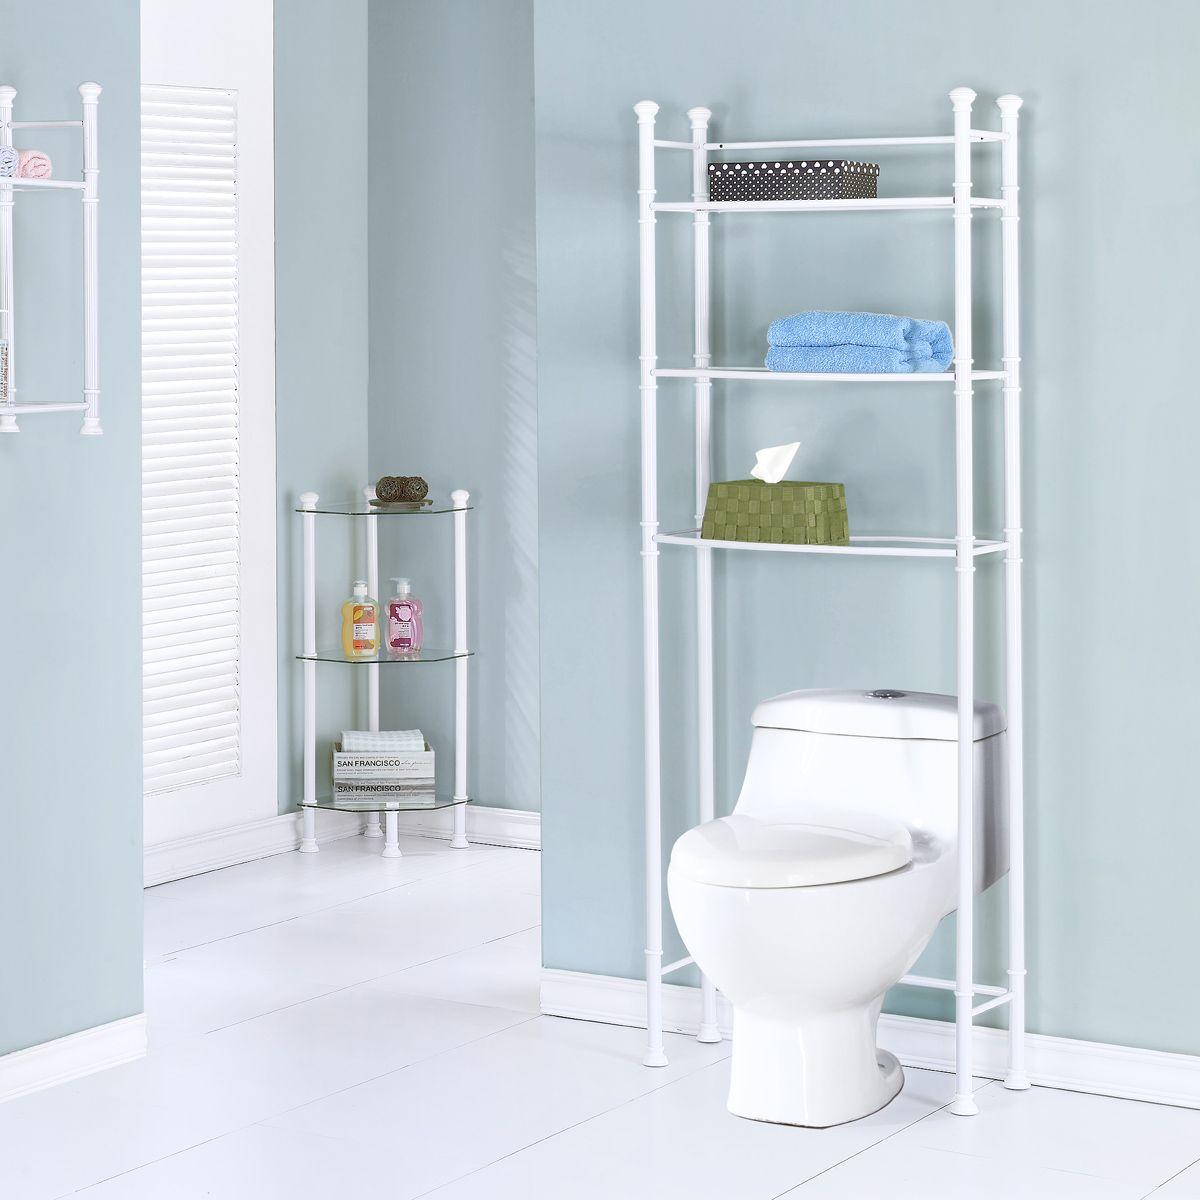 Small Space Room Furniture tip # 572 | picha nzuri | Pinterest ...